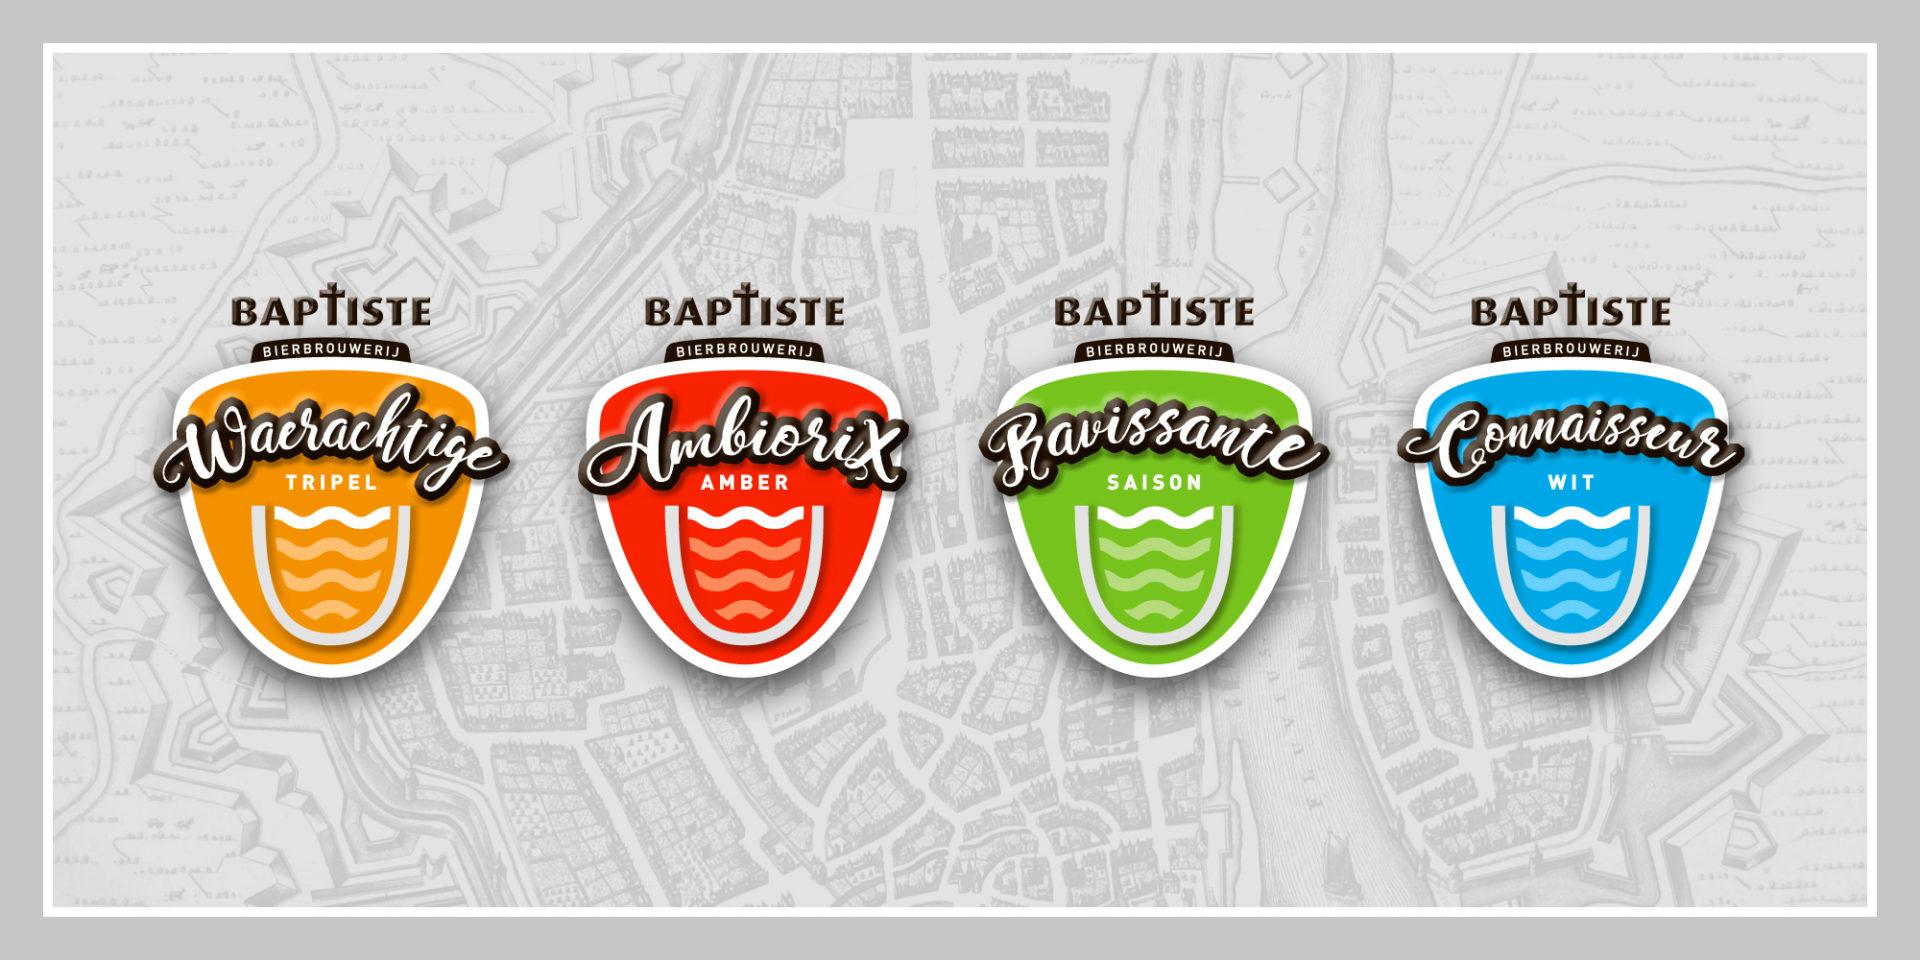 Baptiste etiketten - Jeroen Borrenbergs)